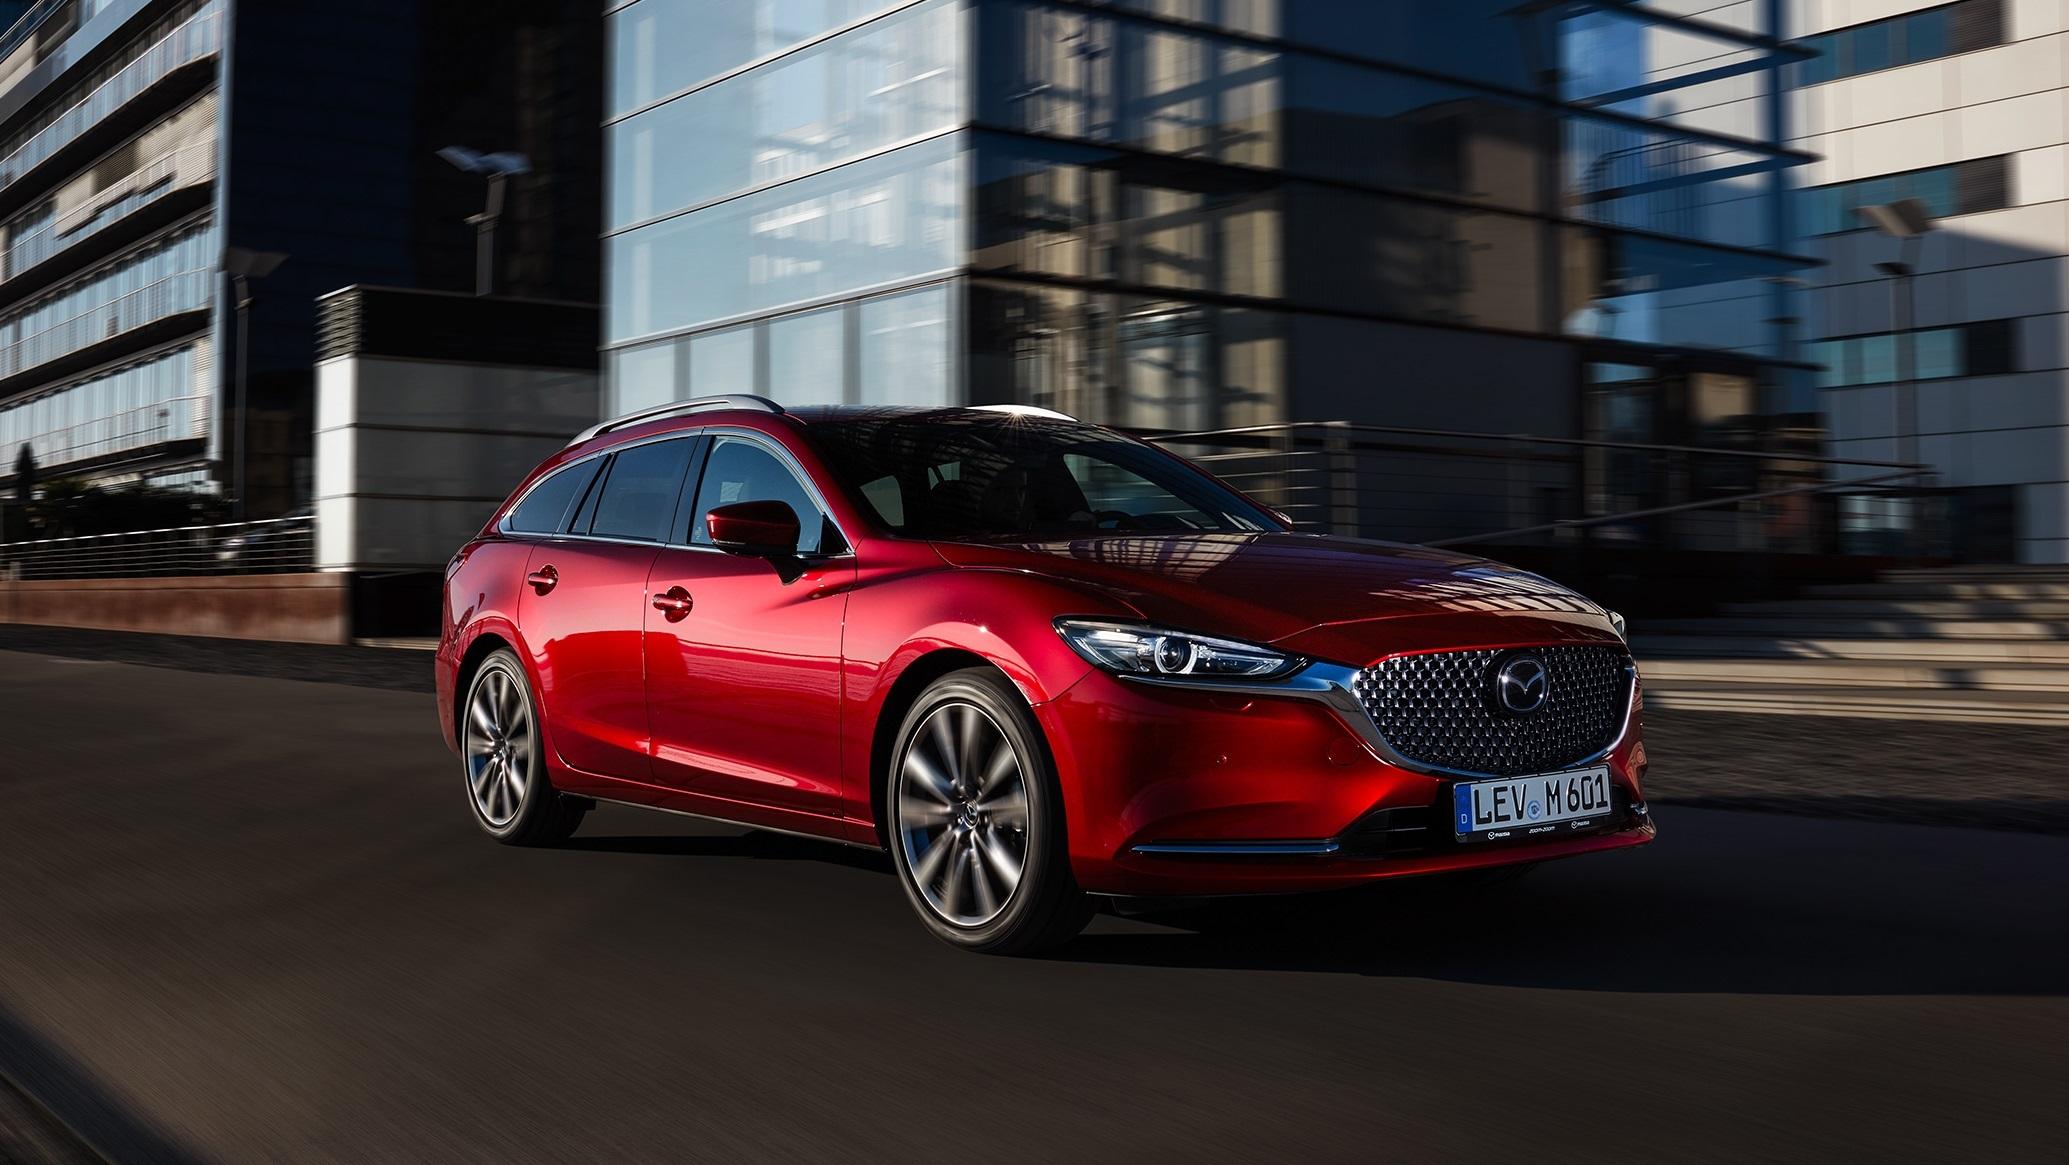 Hyundai Derniers Mod C3 A8les >> List Of Euro 6d Temp Diesels Expands Significantly Fleet Europe